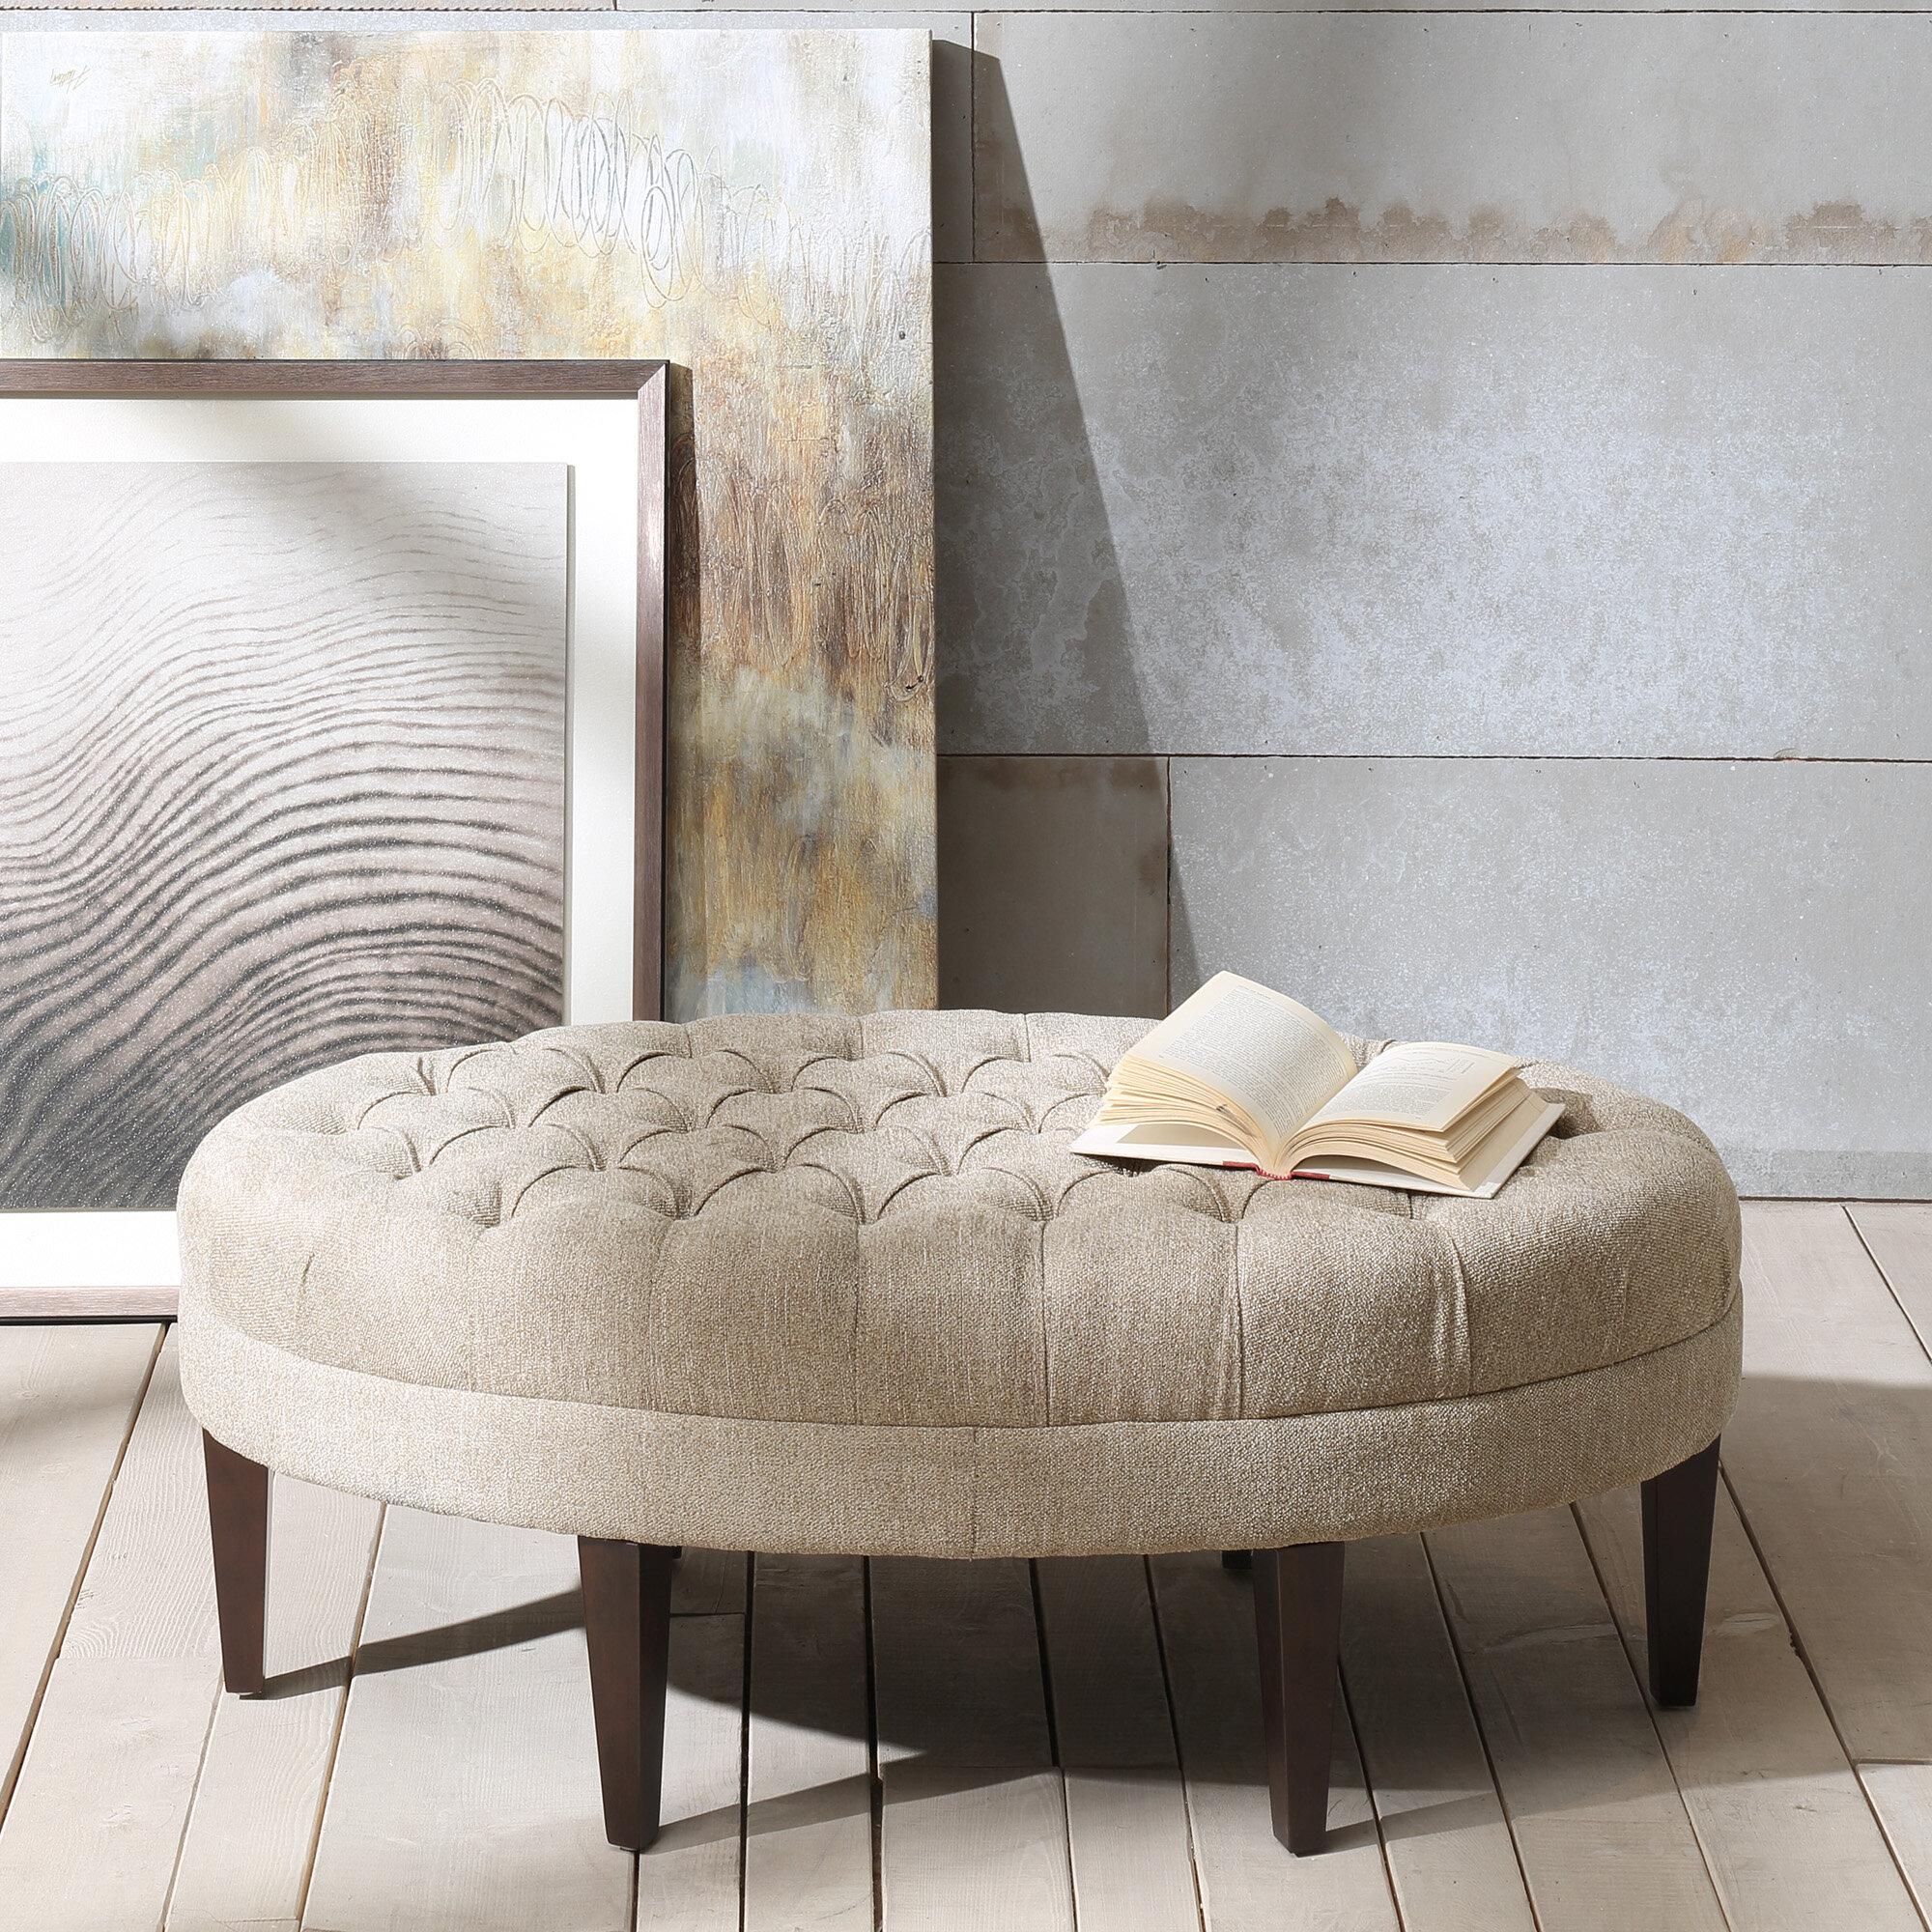 Tremendous Keats Tufted Cocktail Ottoman Evergreenethics Interior Chair Design Evergreenethicsorg